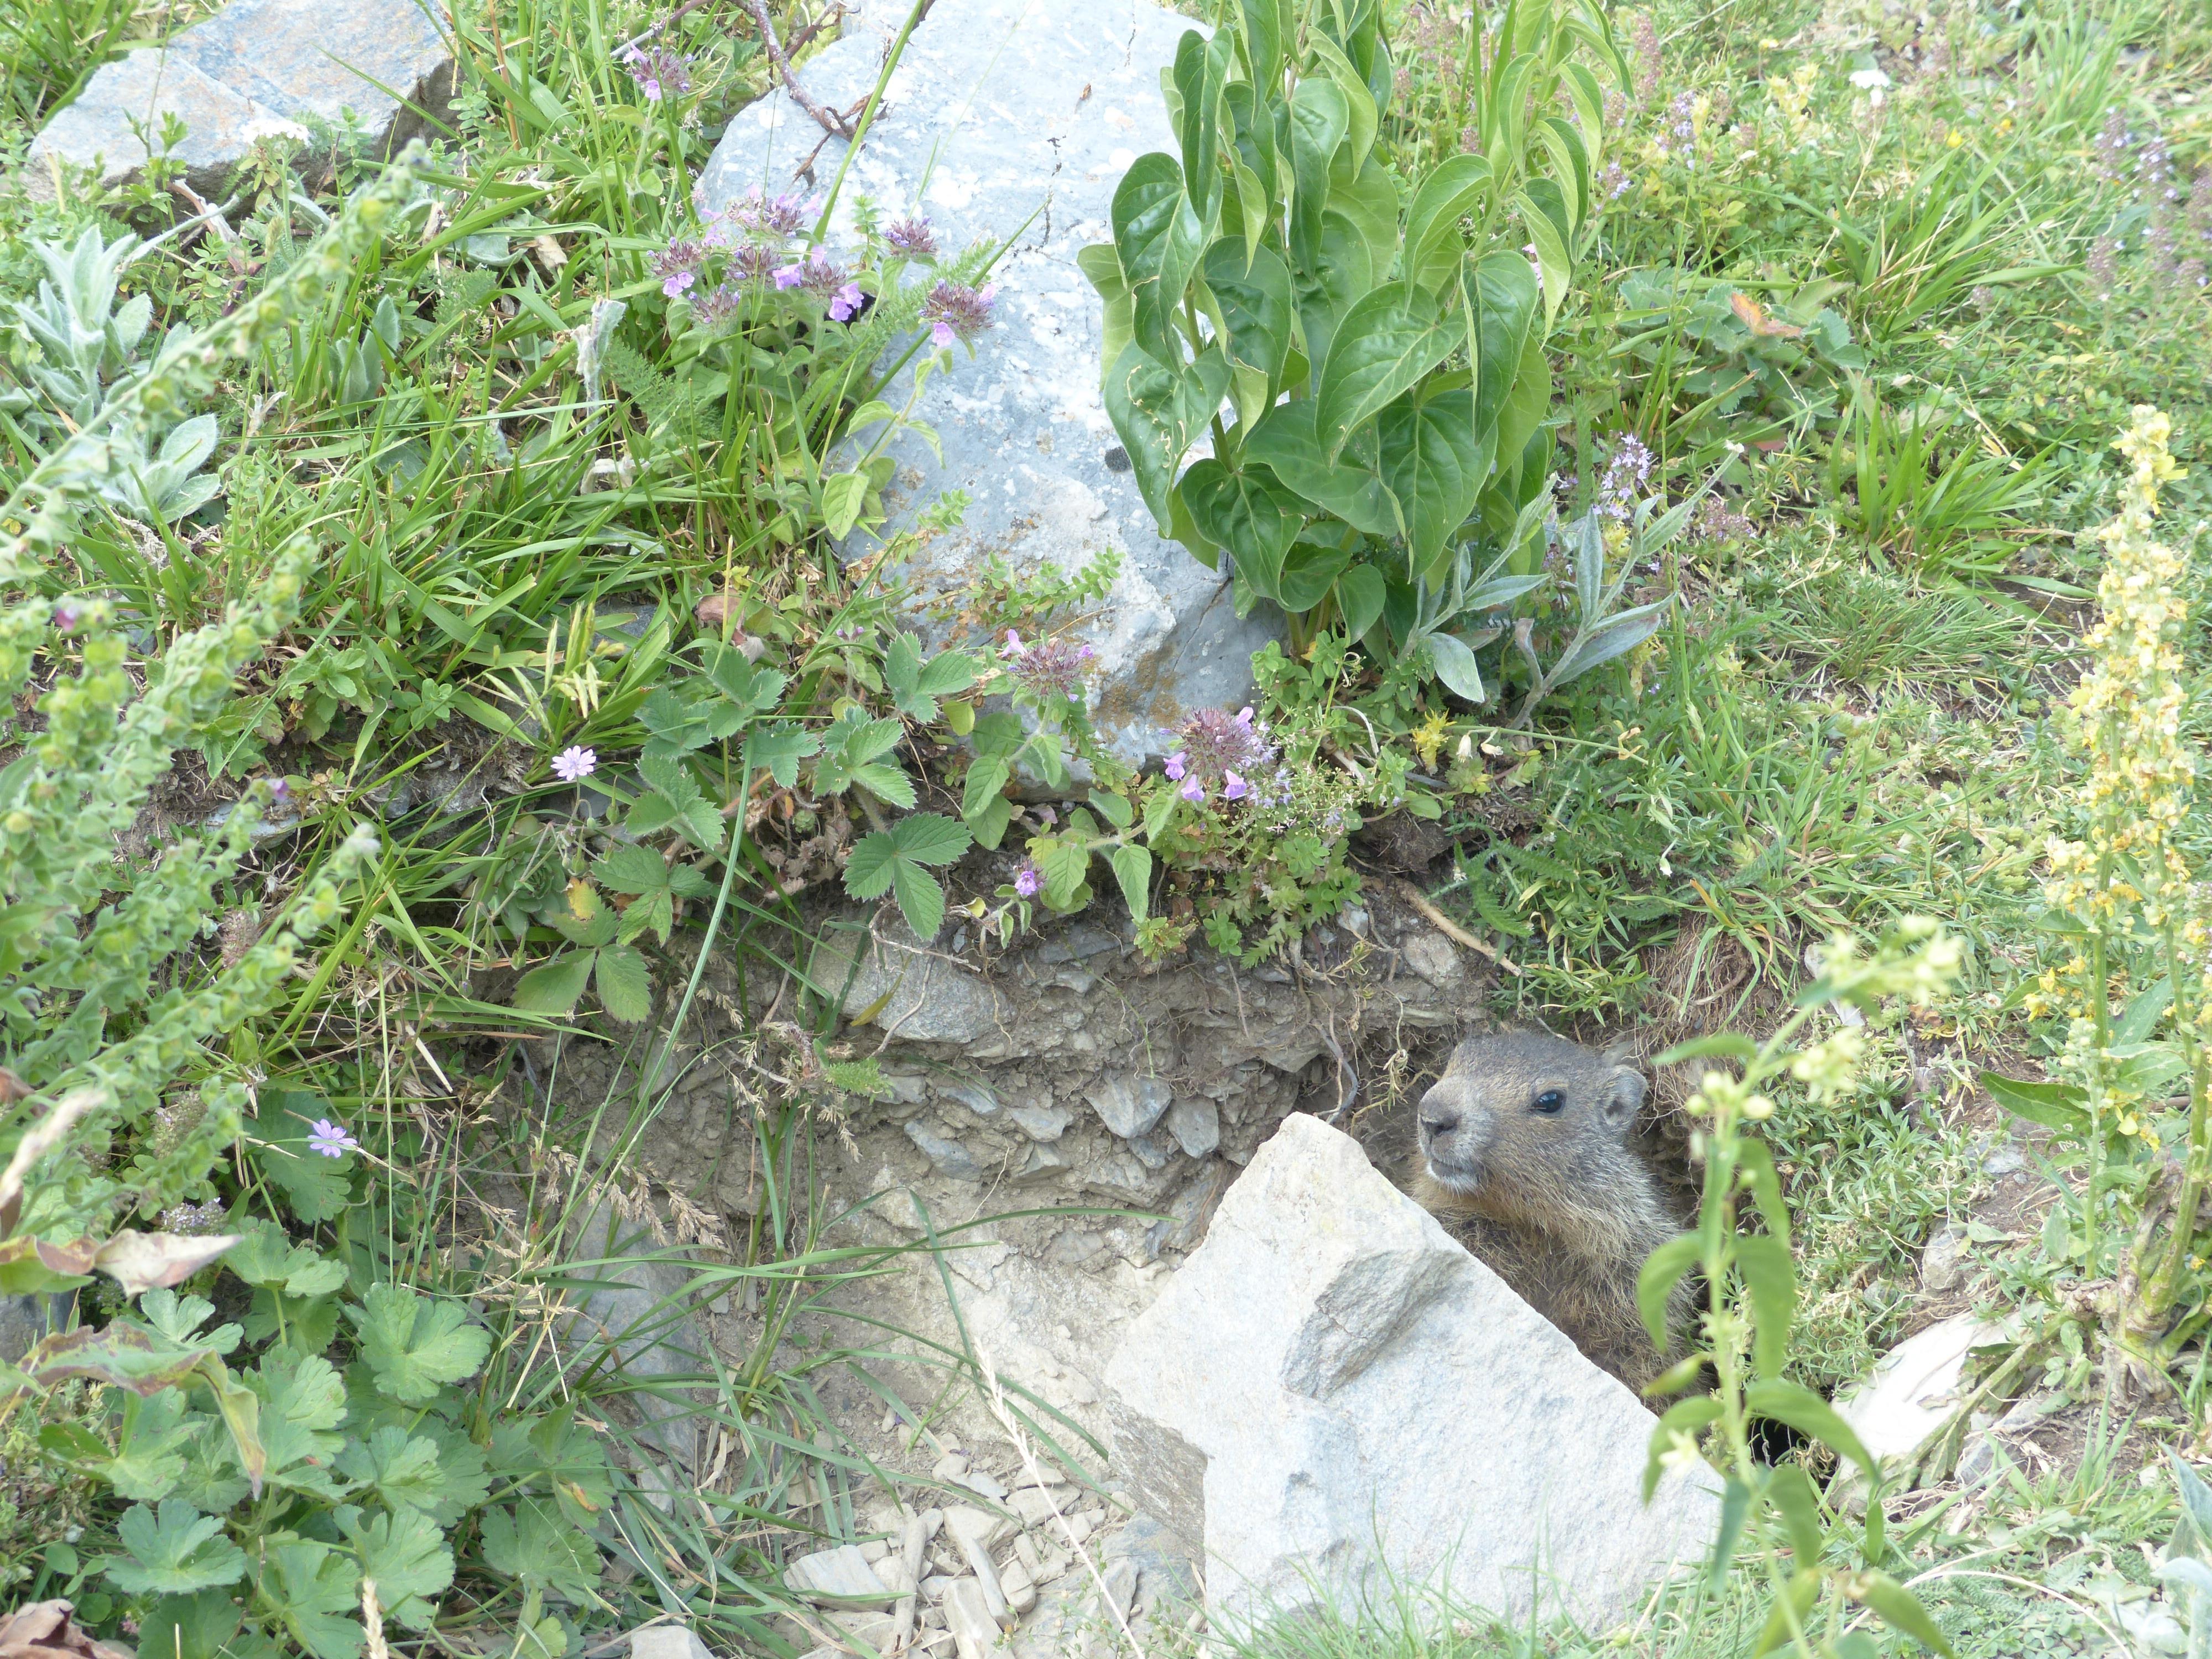 Free Images Hole Flower Wildlife Garden Rodent North Yard Mountain Meadow Marmot Engineering True Gophers Alpine Marmota